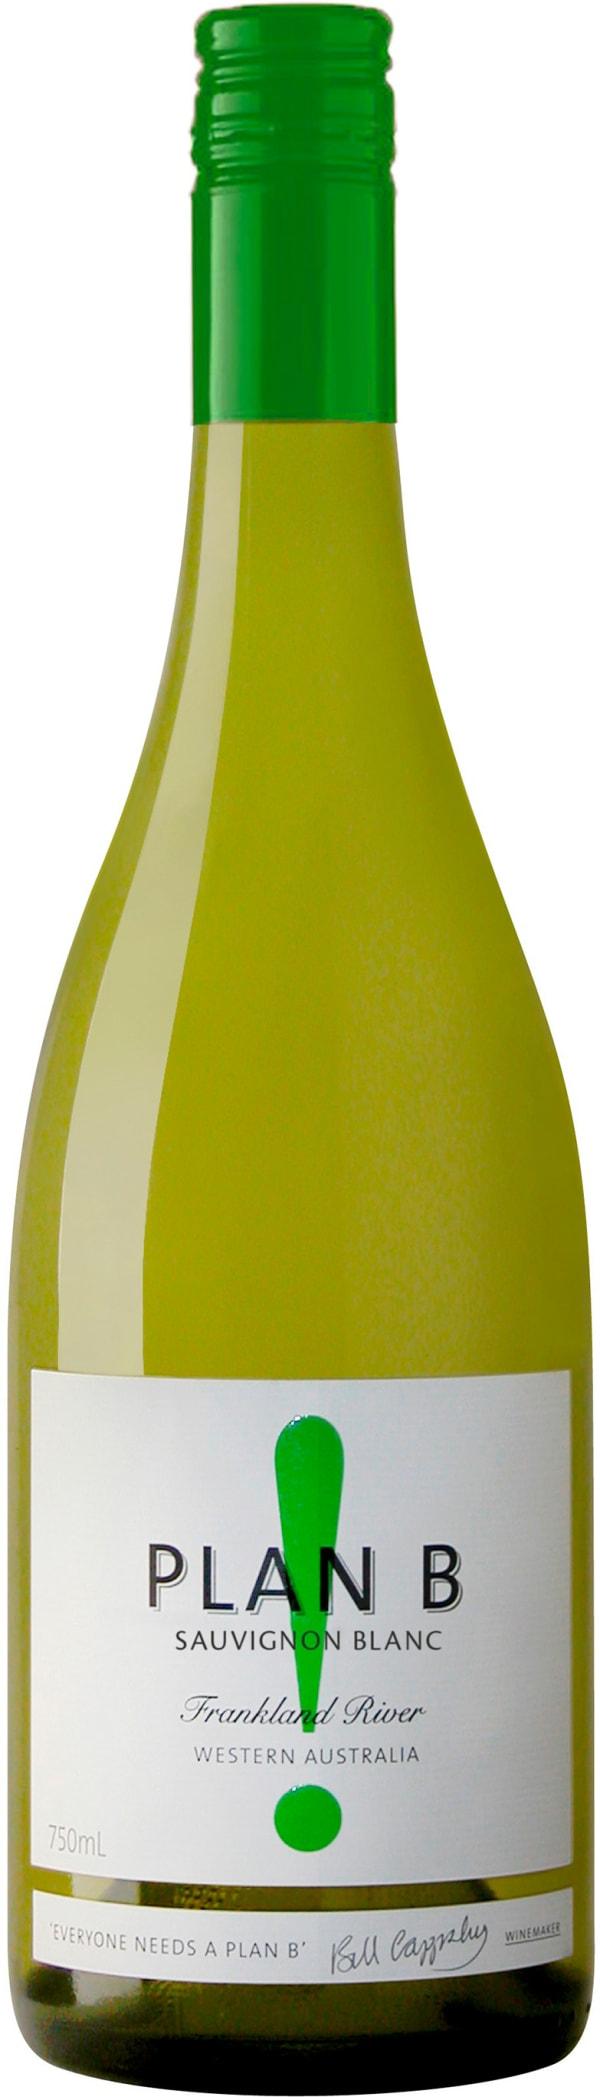 Plan B Sauvignon Blanc 2016